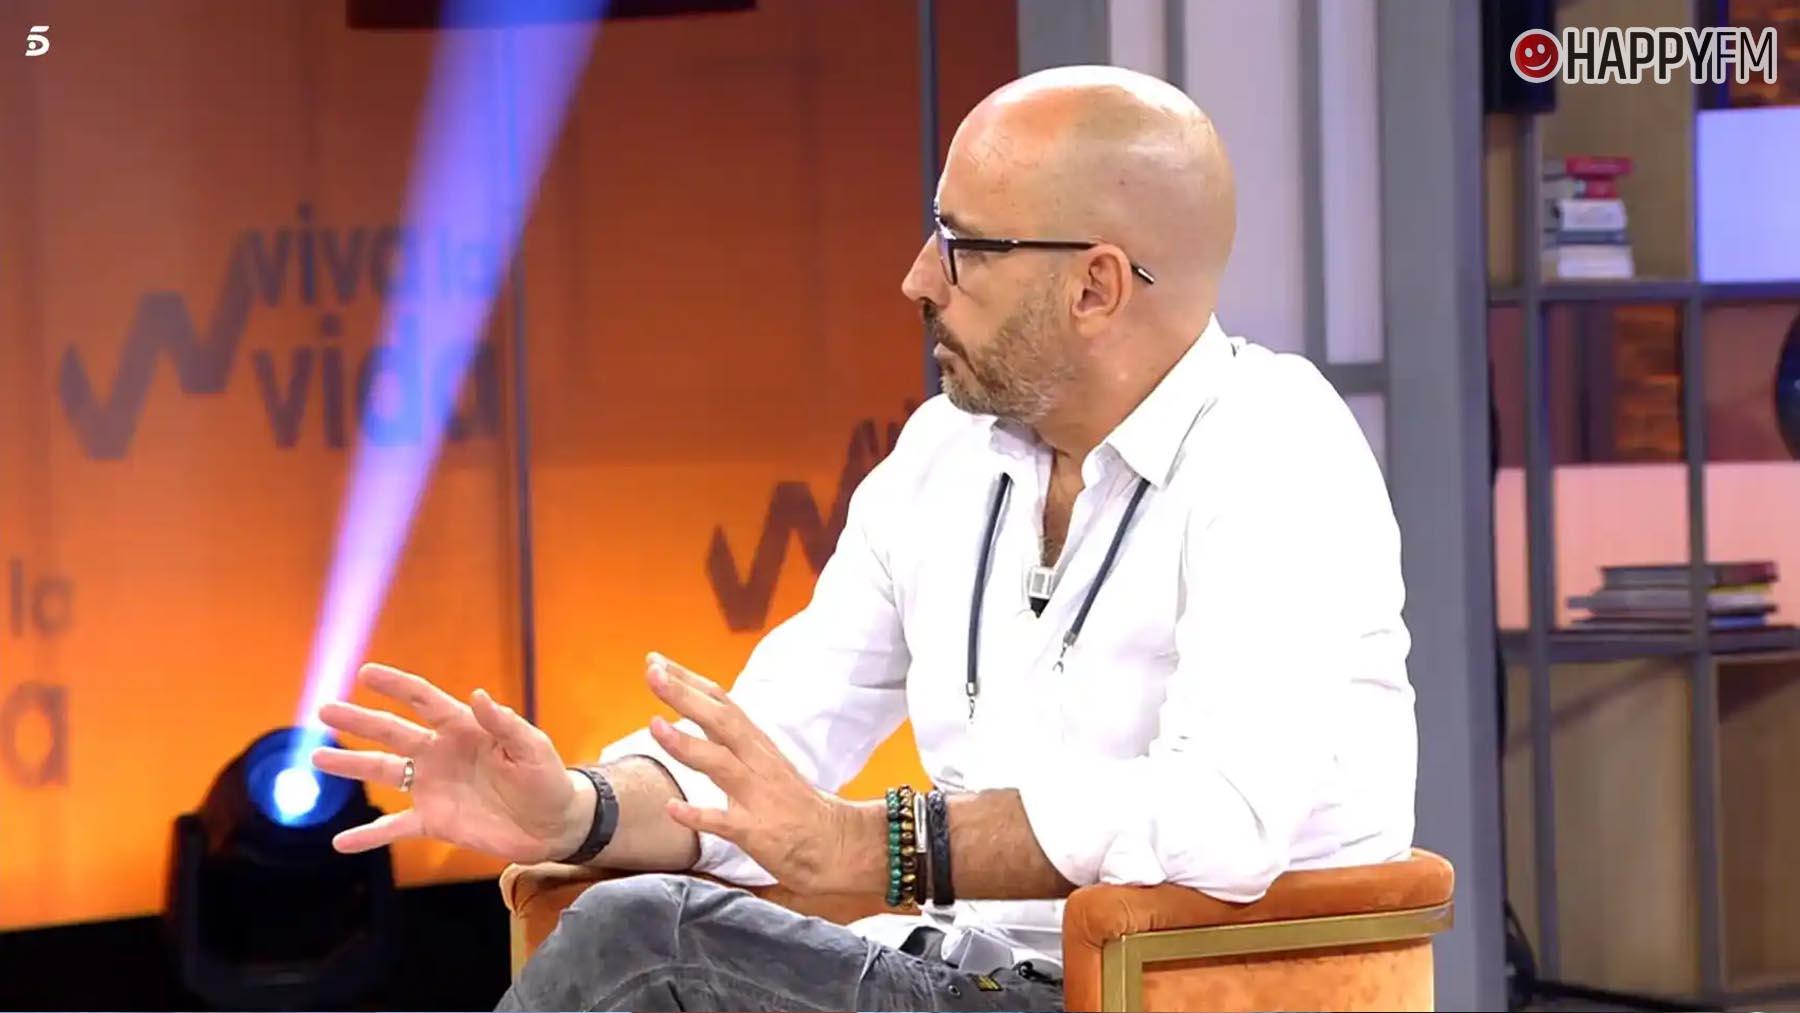 Diego Arrabal